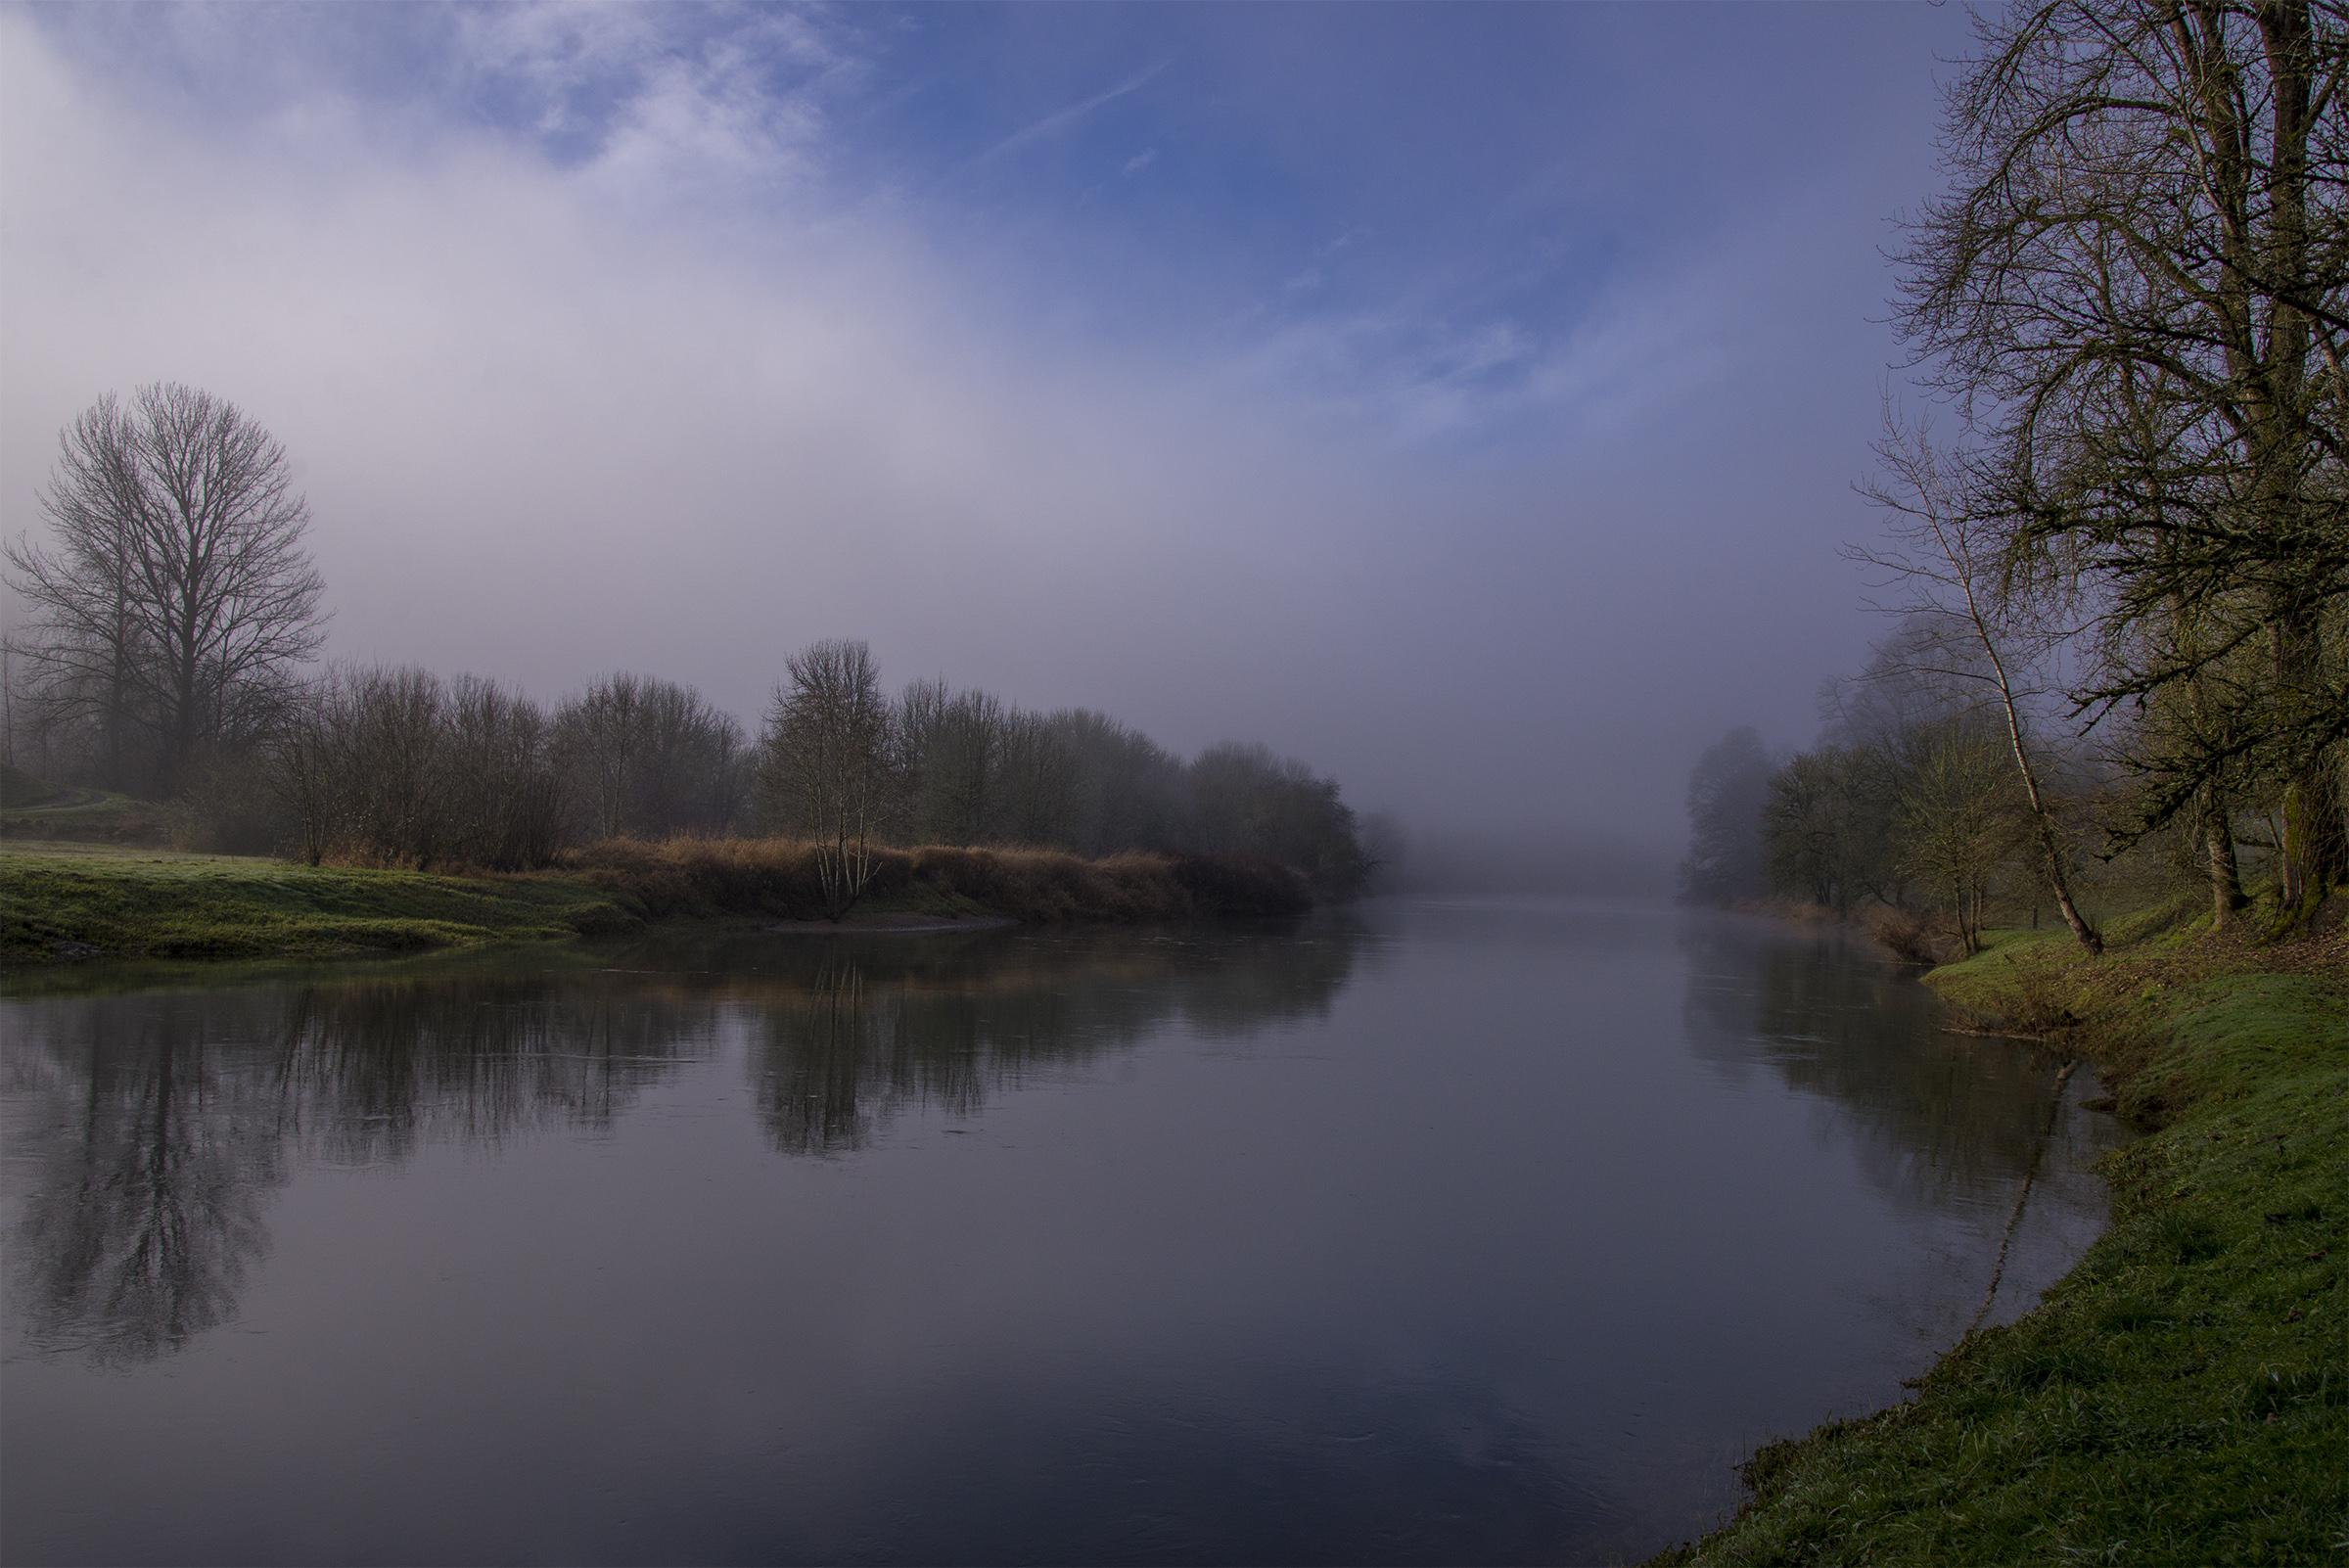 River_1_M.jpg